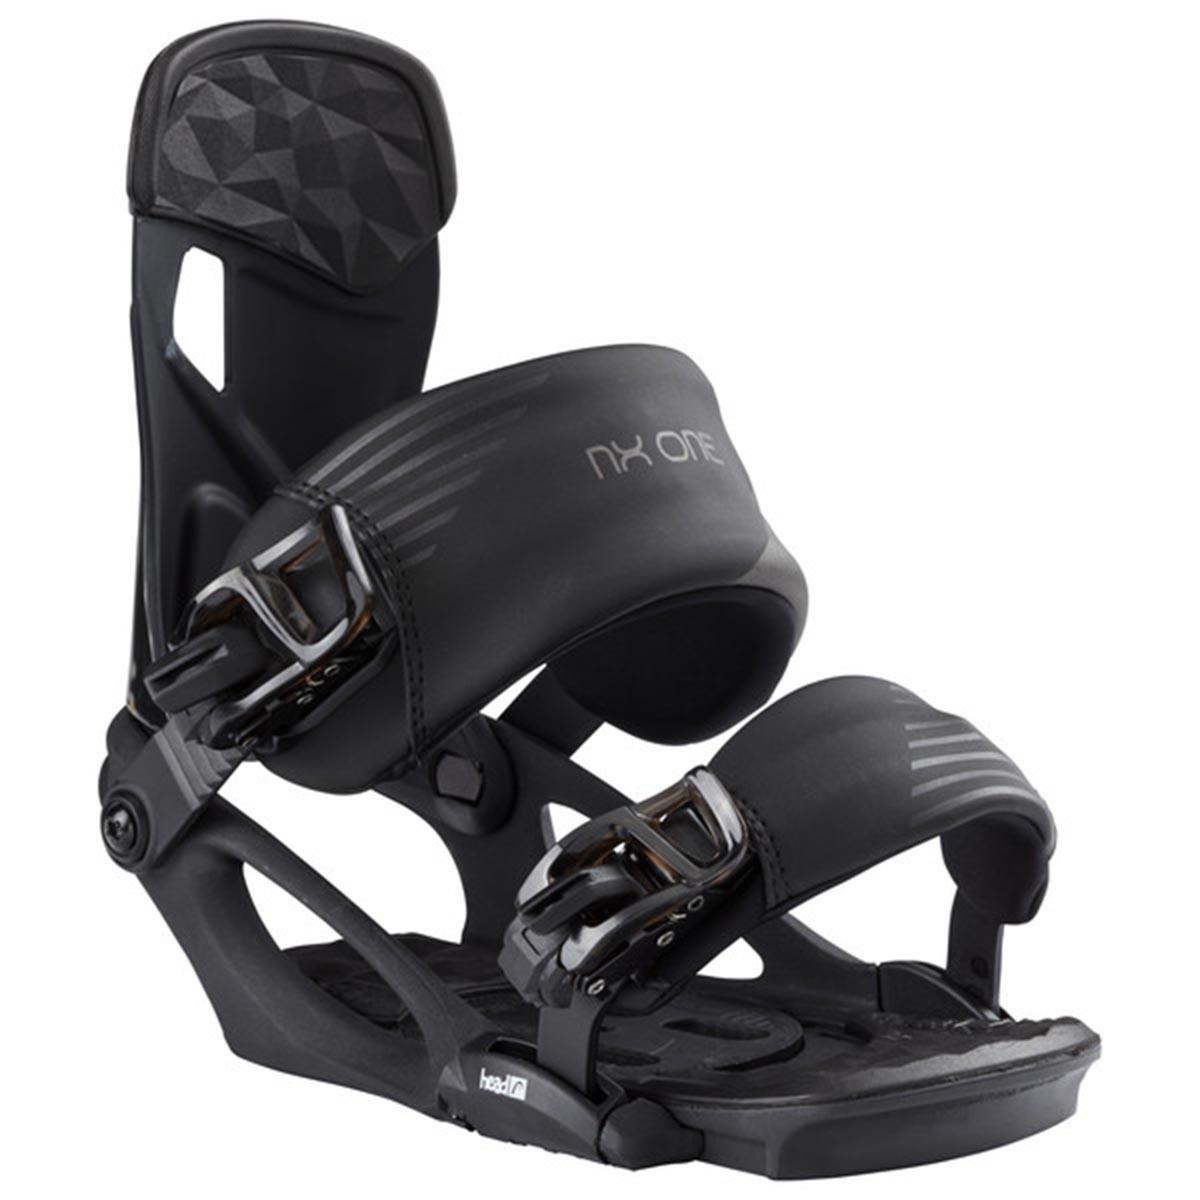 Head Head NX One Snowboard Bindings 2020